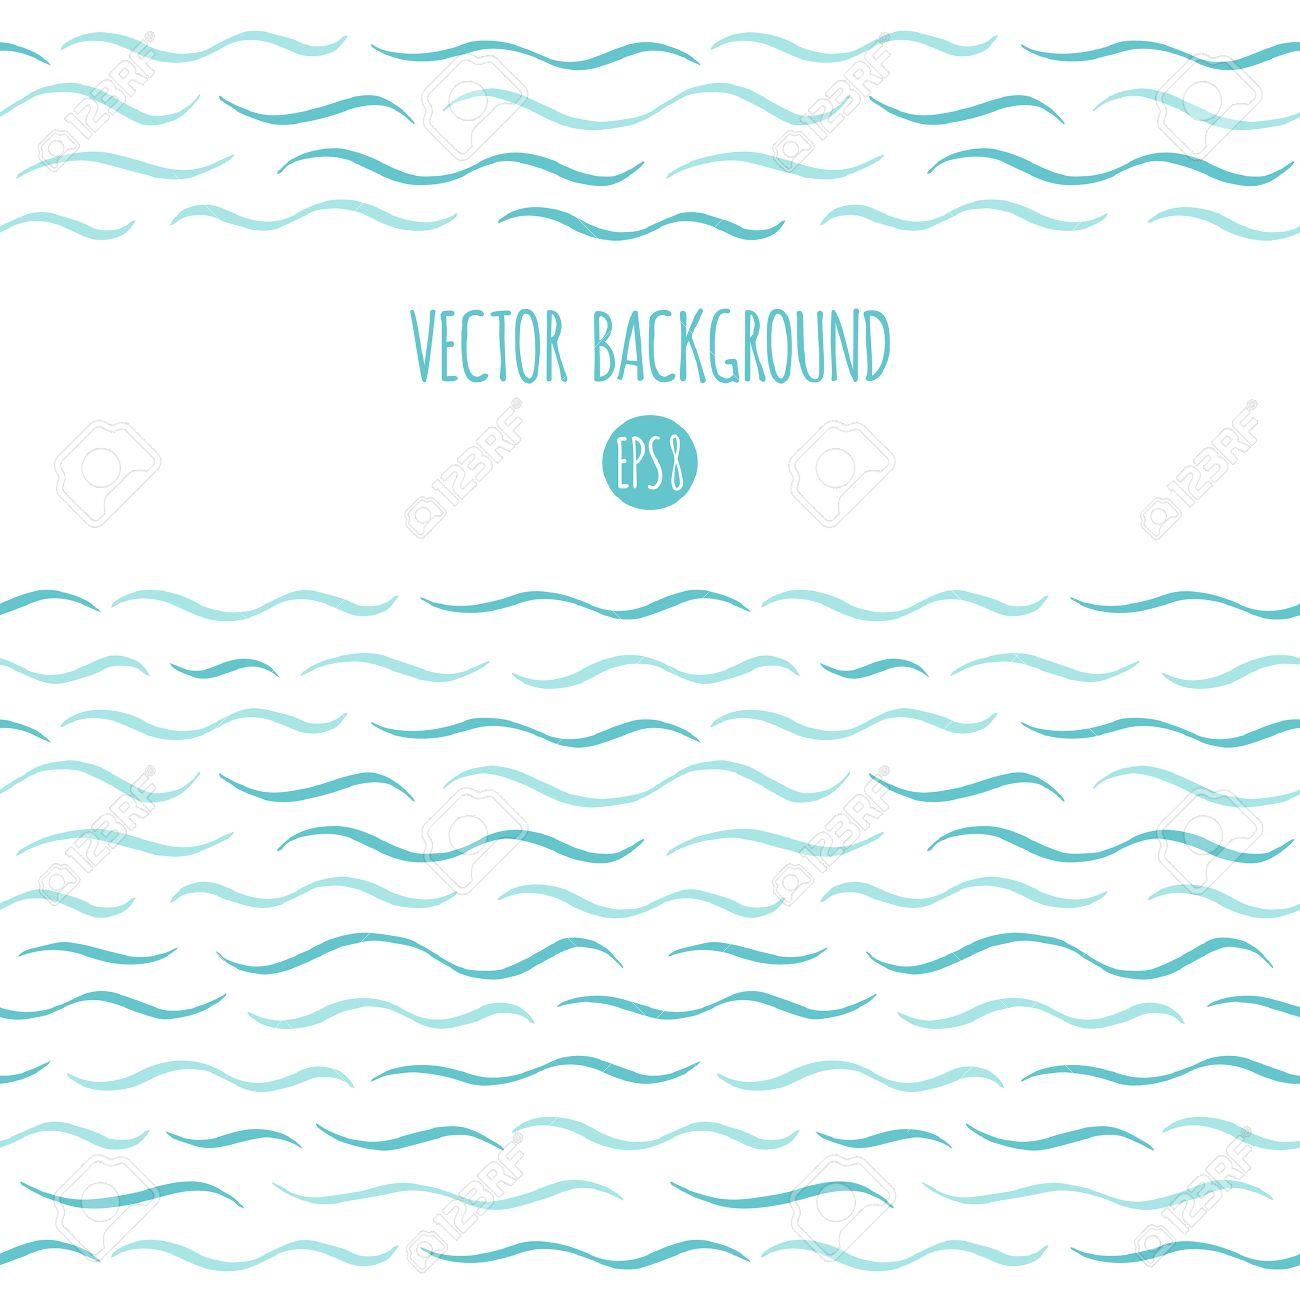 Waves Vector Background. Marine, Maritime, Sea, Ocean Seamless ...